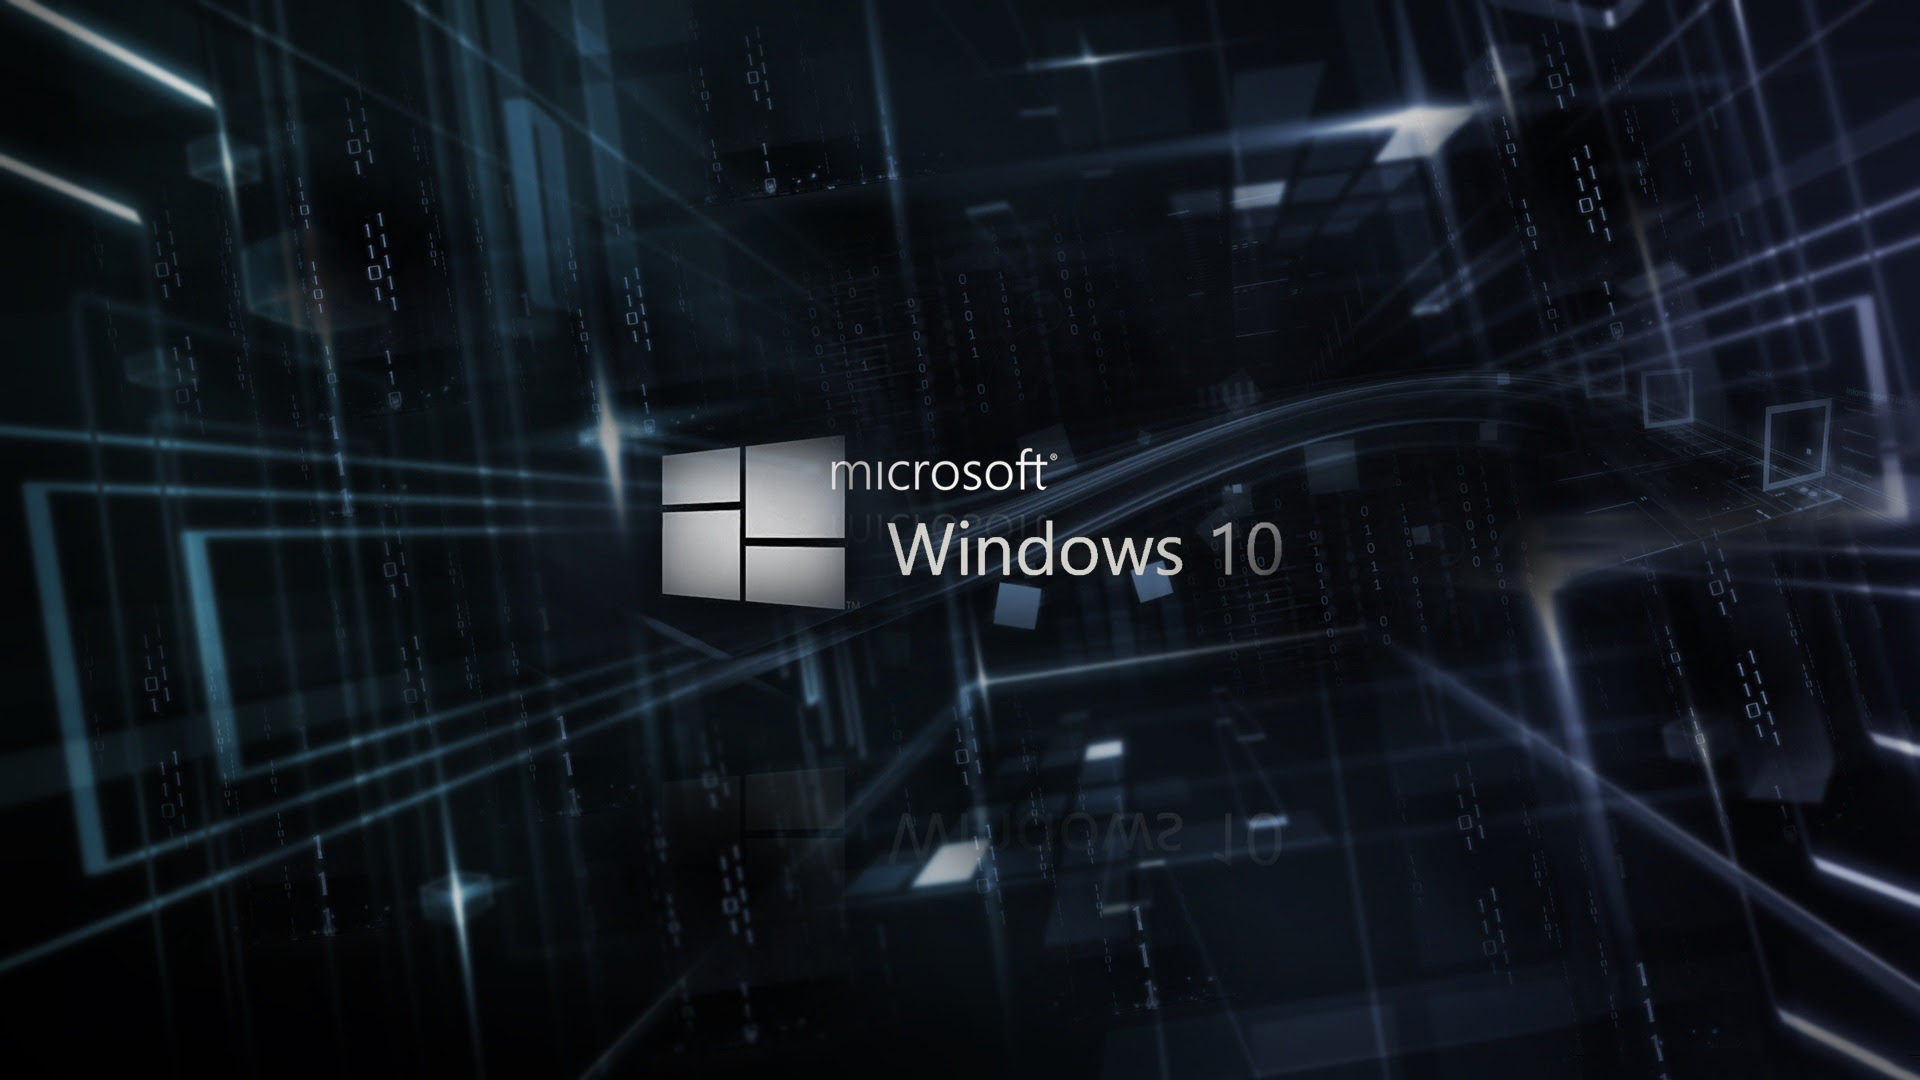 download wallpaper - Pc Wallpaper Free Download Windows 10